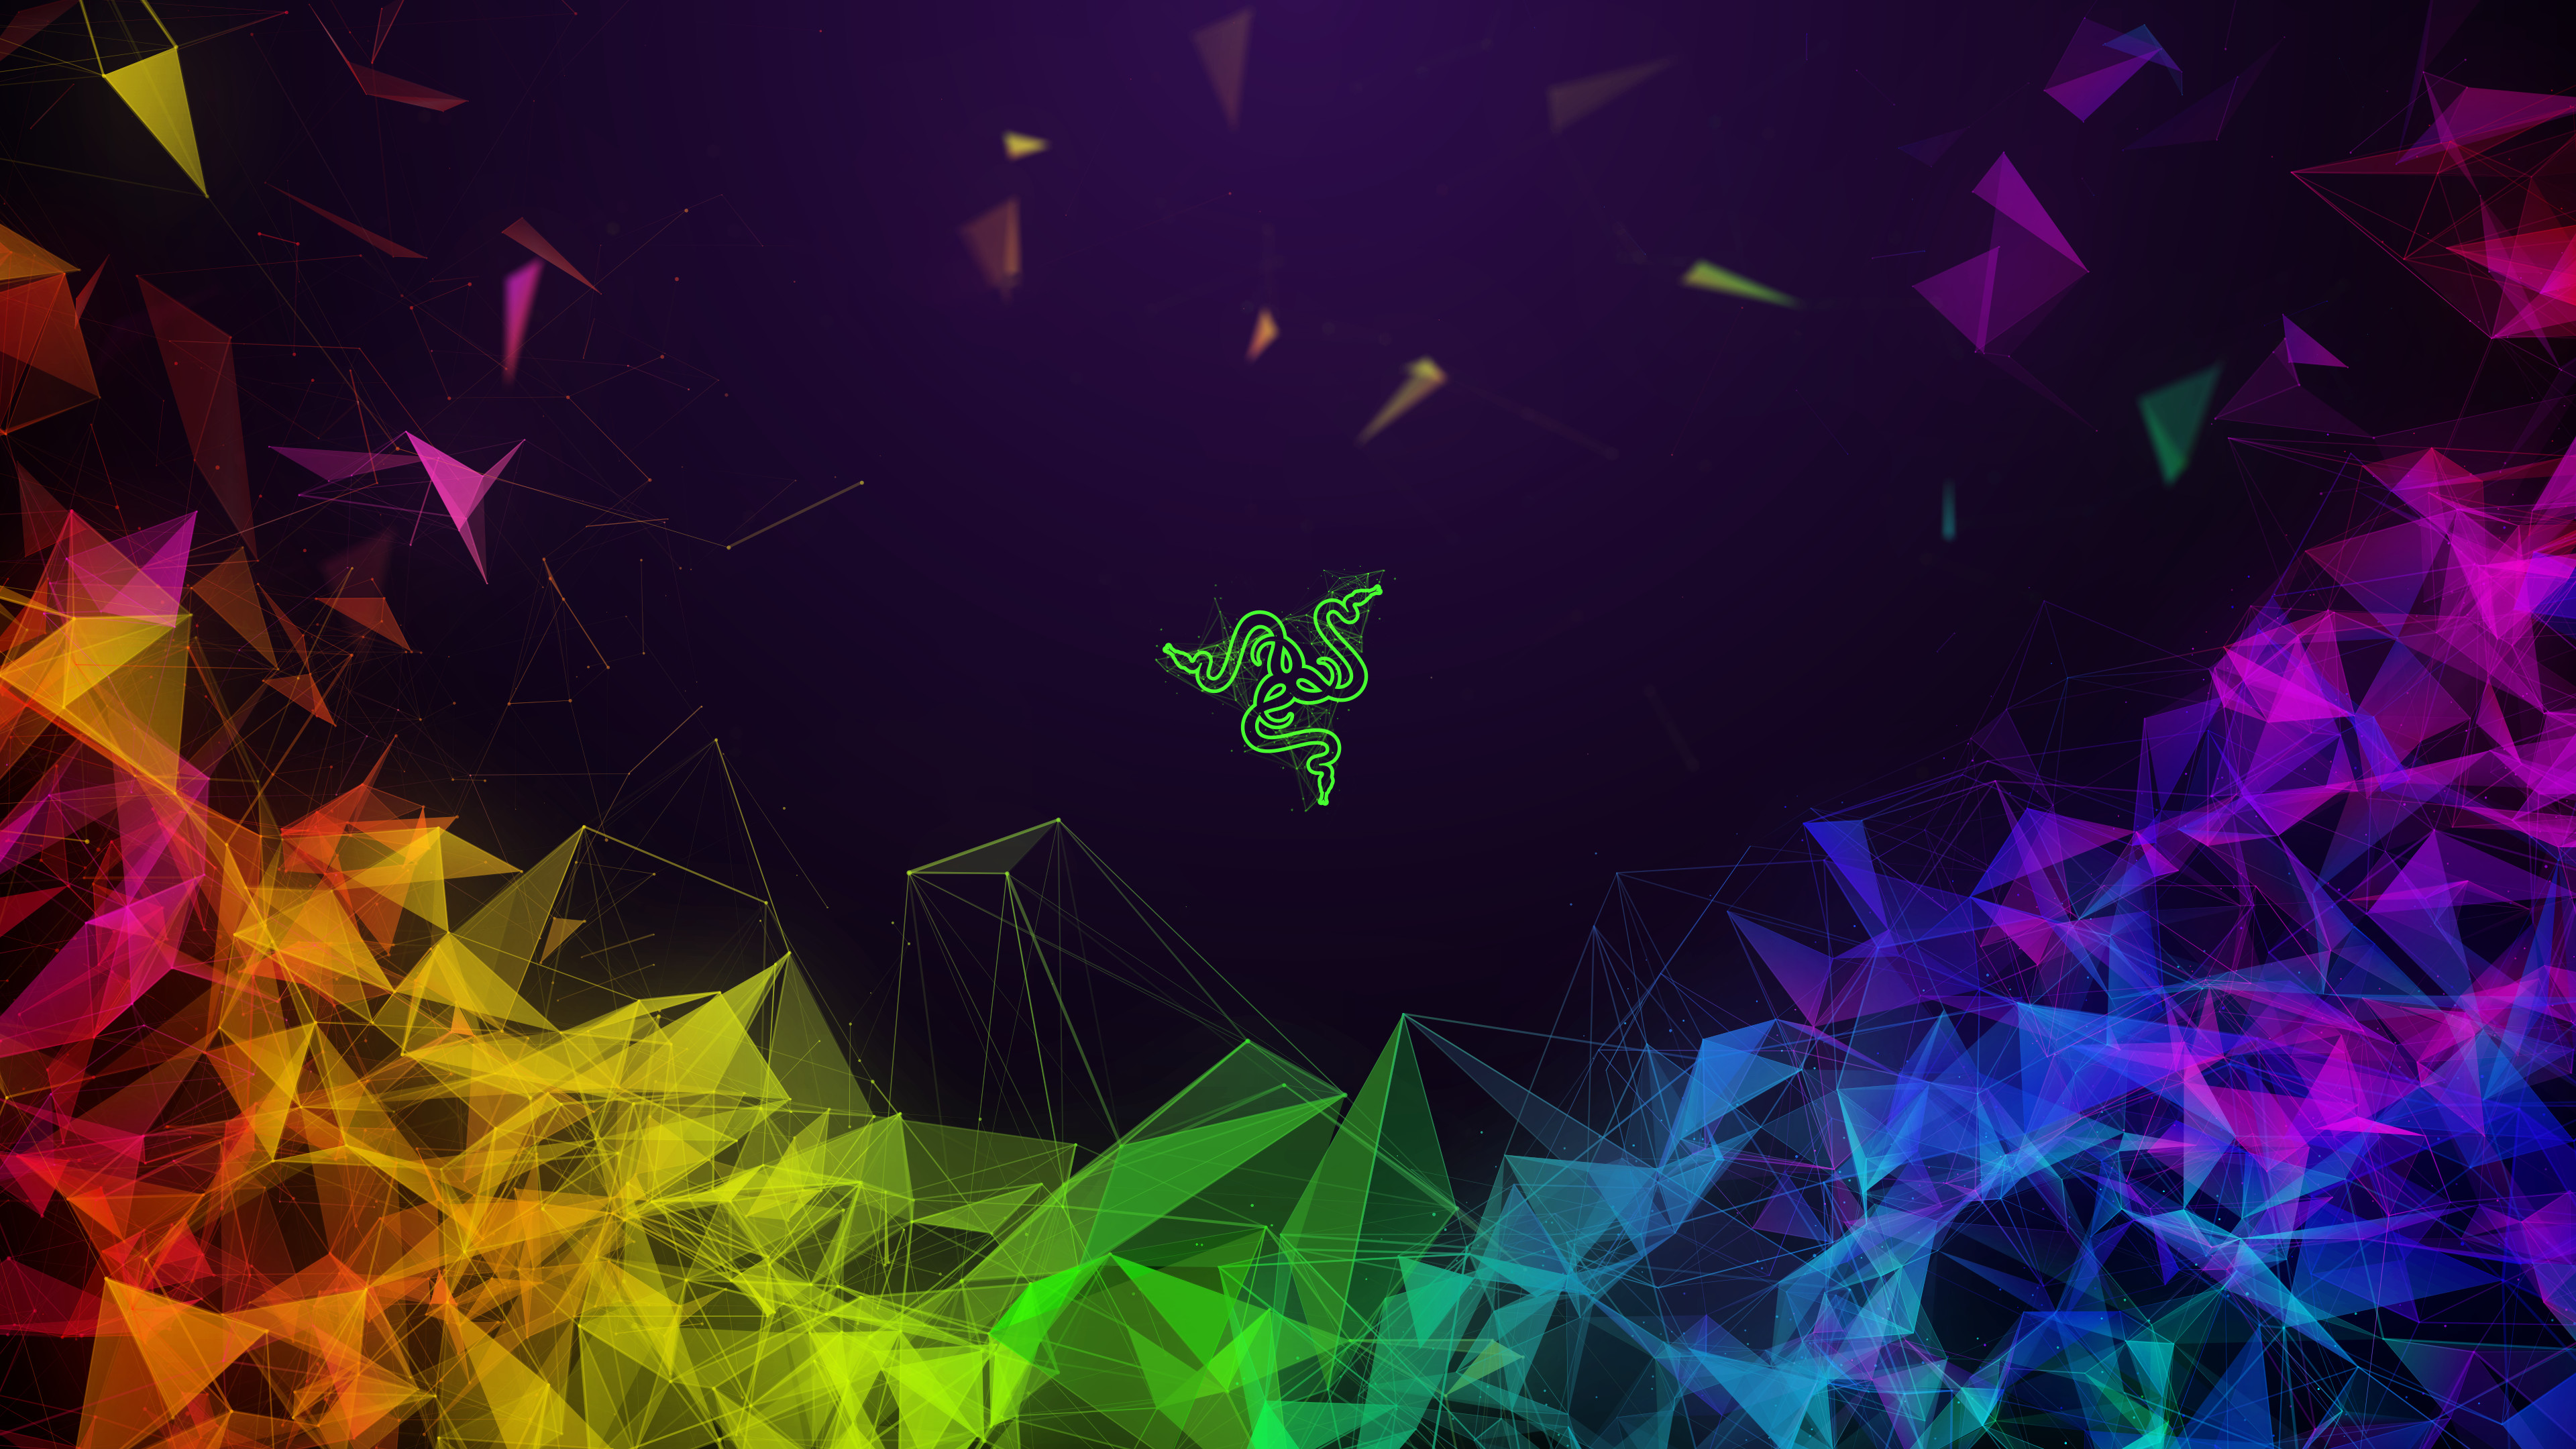 Razer Gaming Wallpapers - Wallpaper Cave